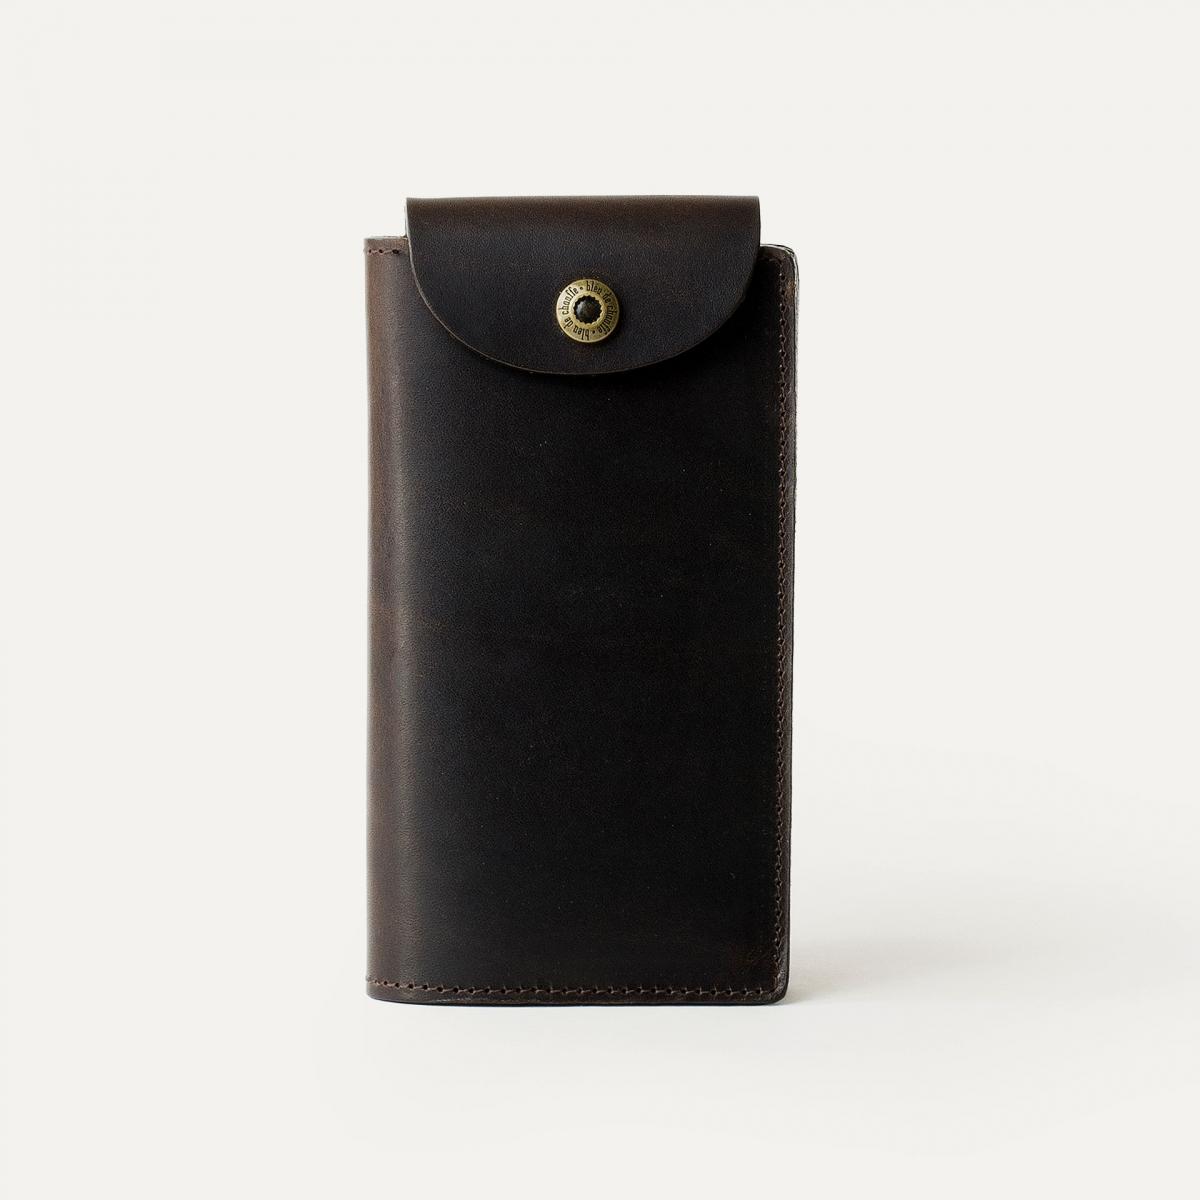 Corto wallet - Expresso (image n°1)